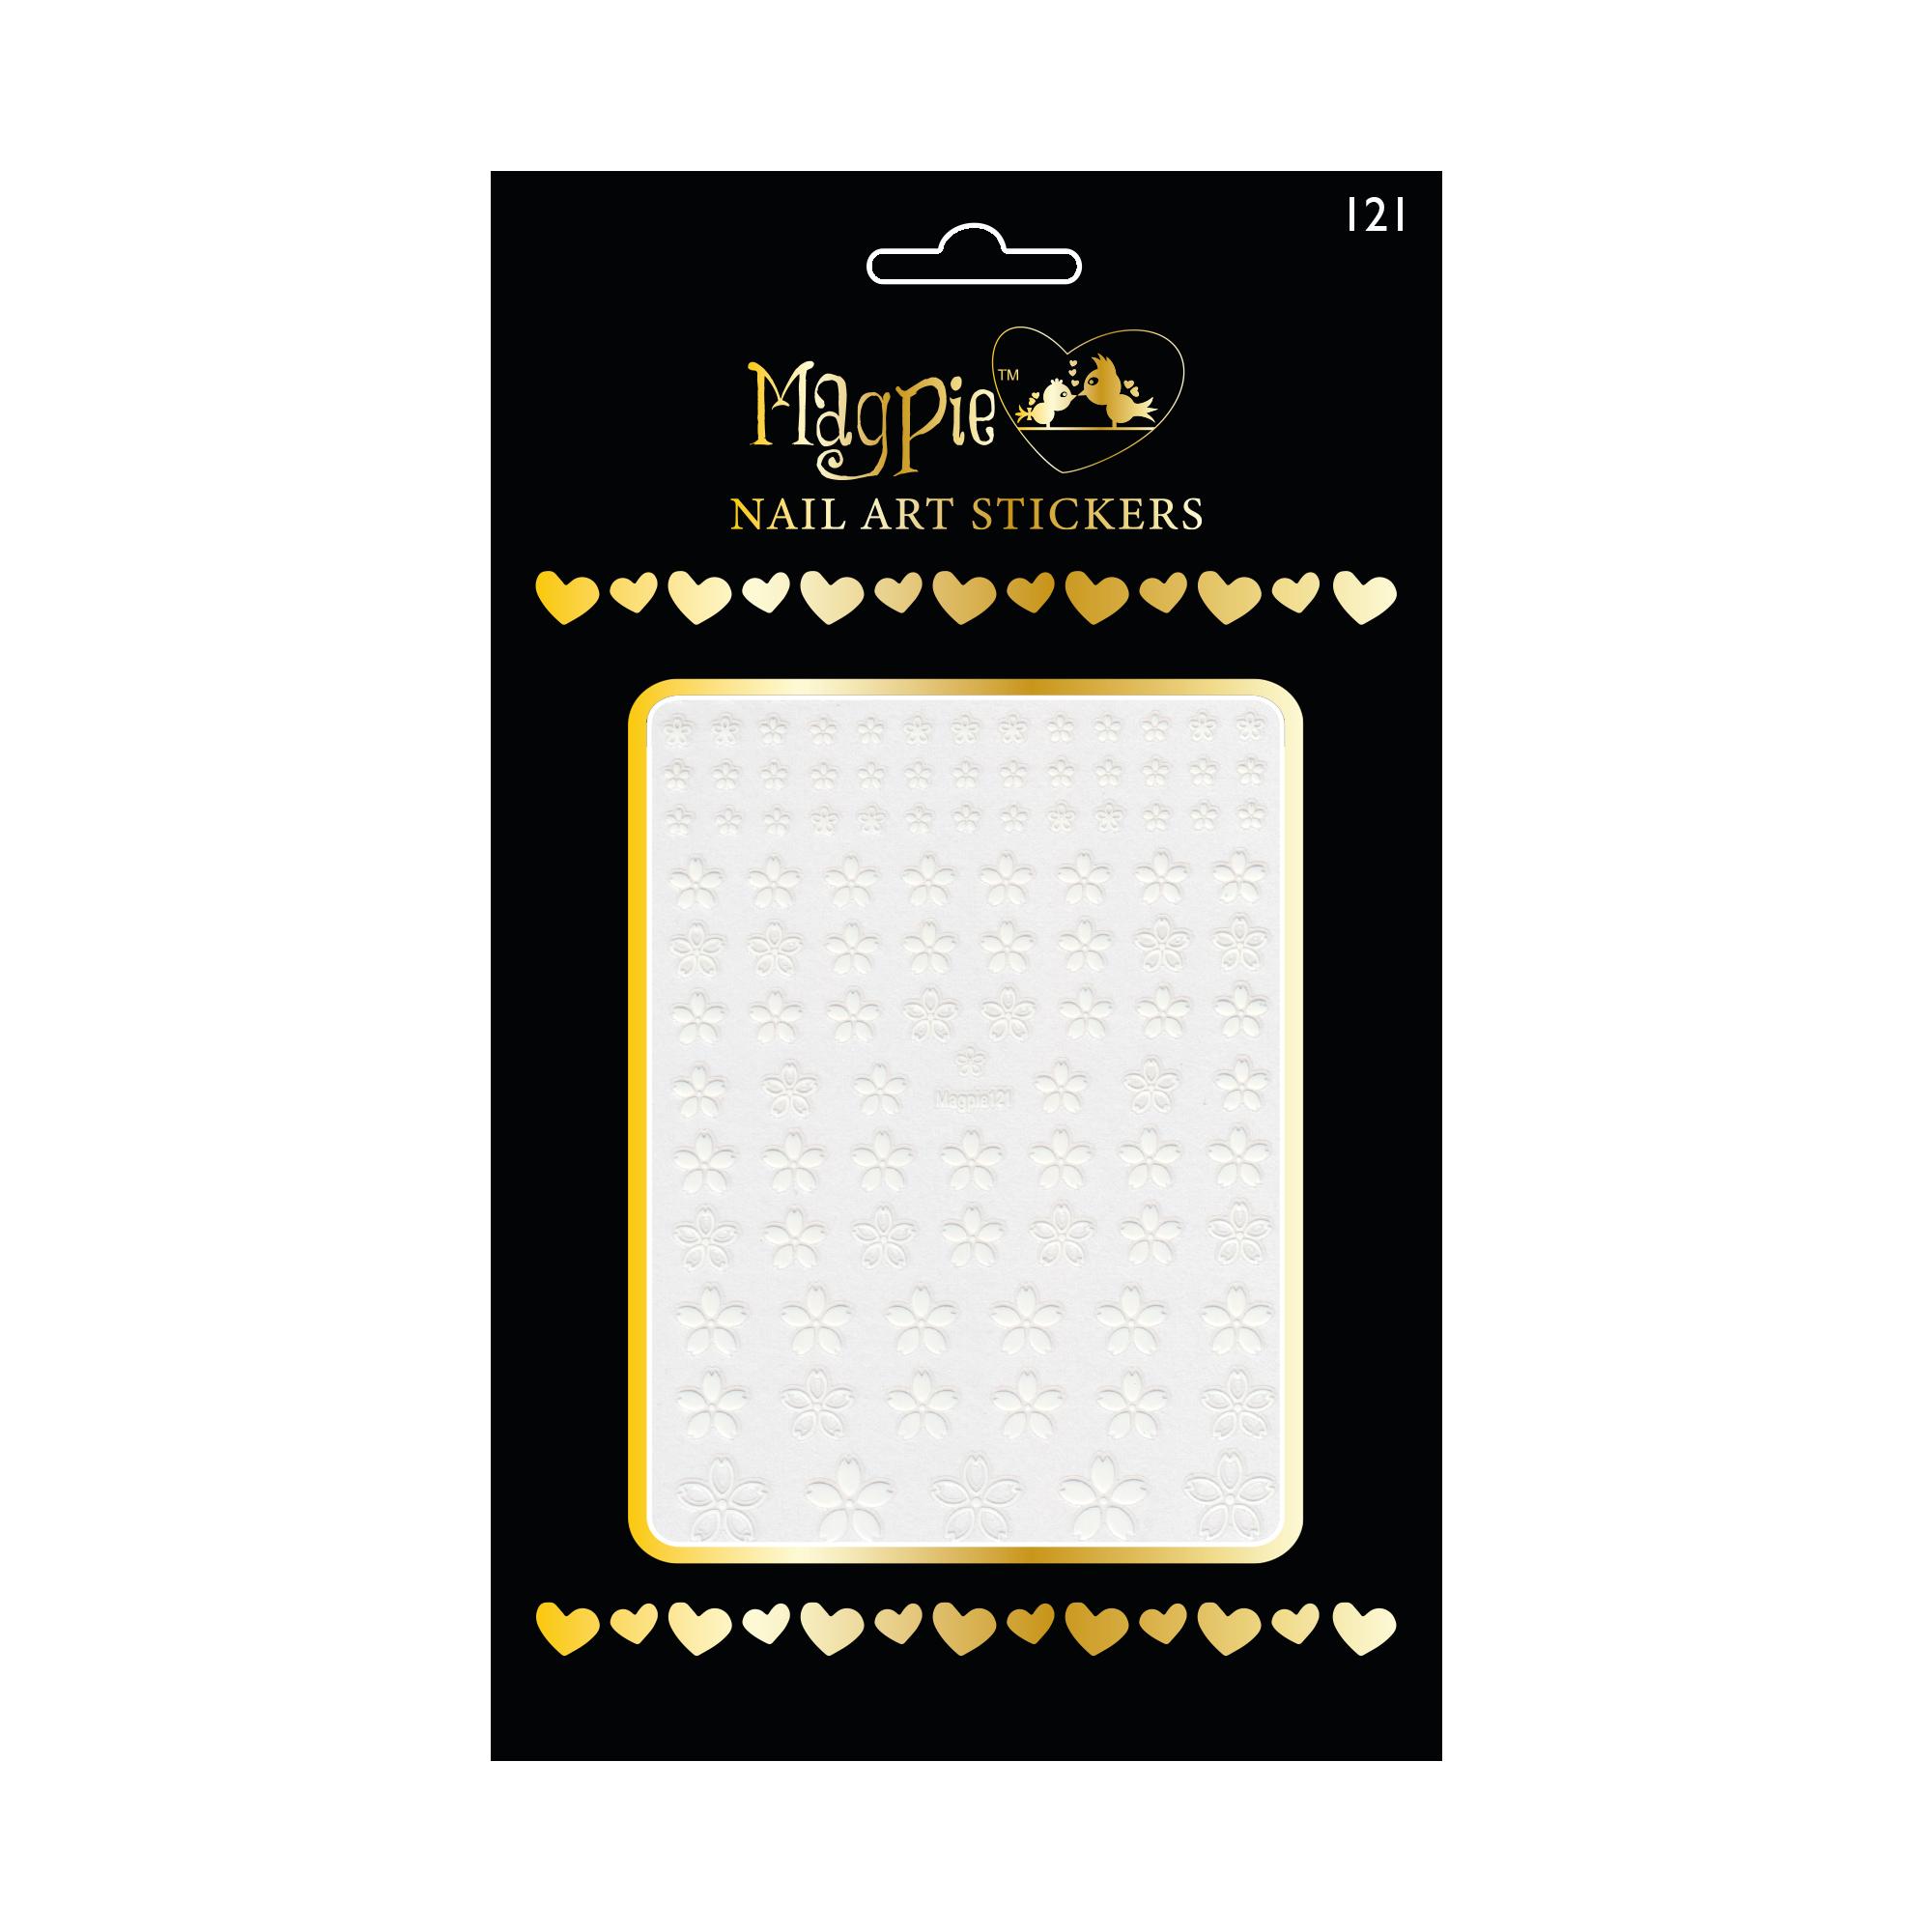 Magpie 121 stickers